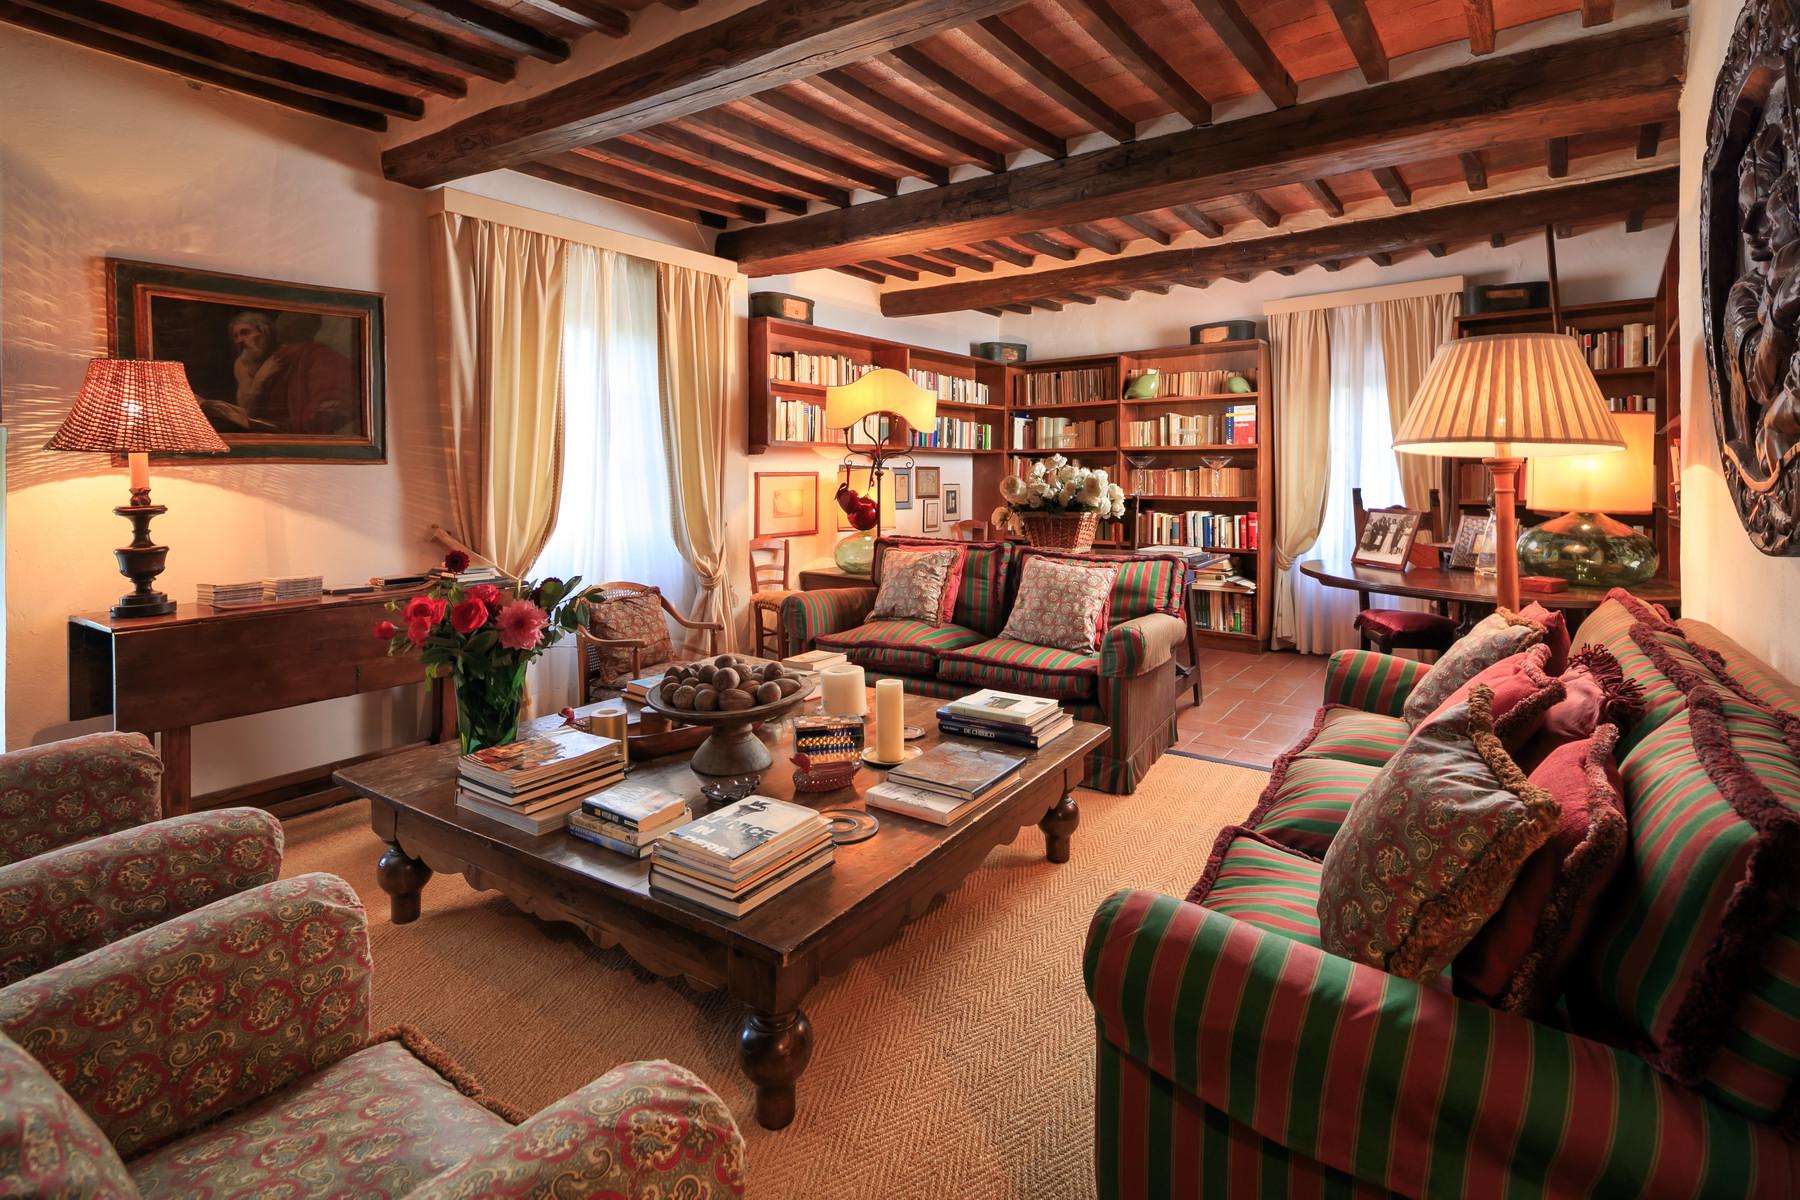 Rustico in Vendita a Castellina In Chianti: 5 locali, 720 mq - Foto 3